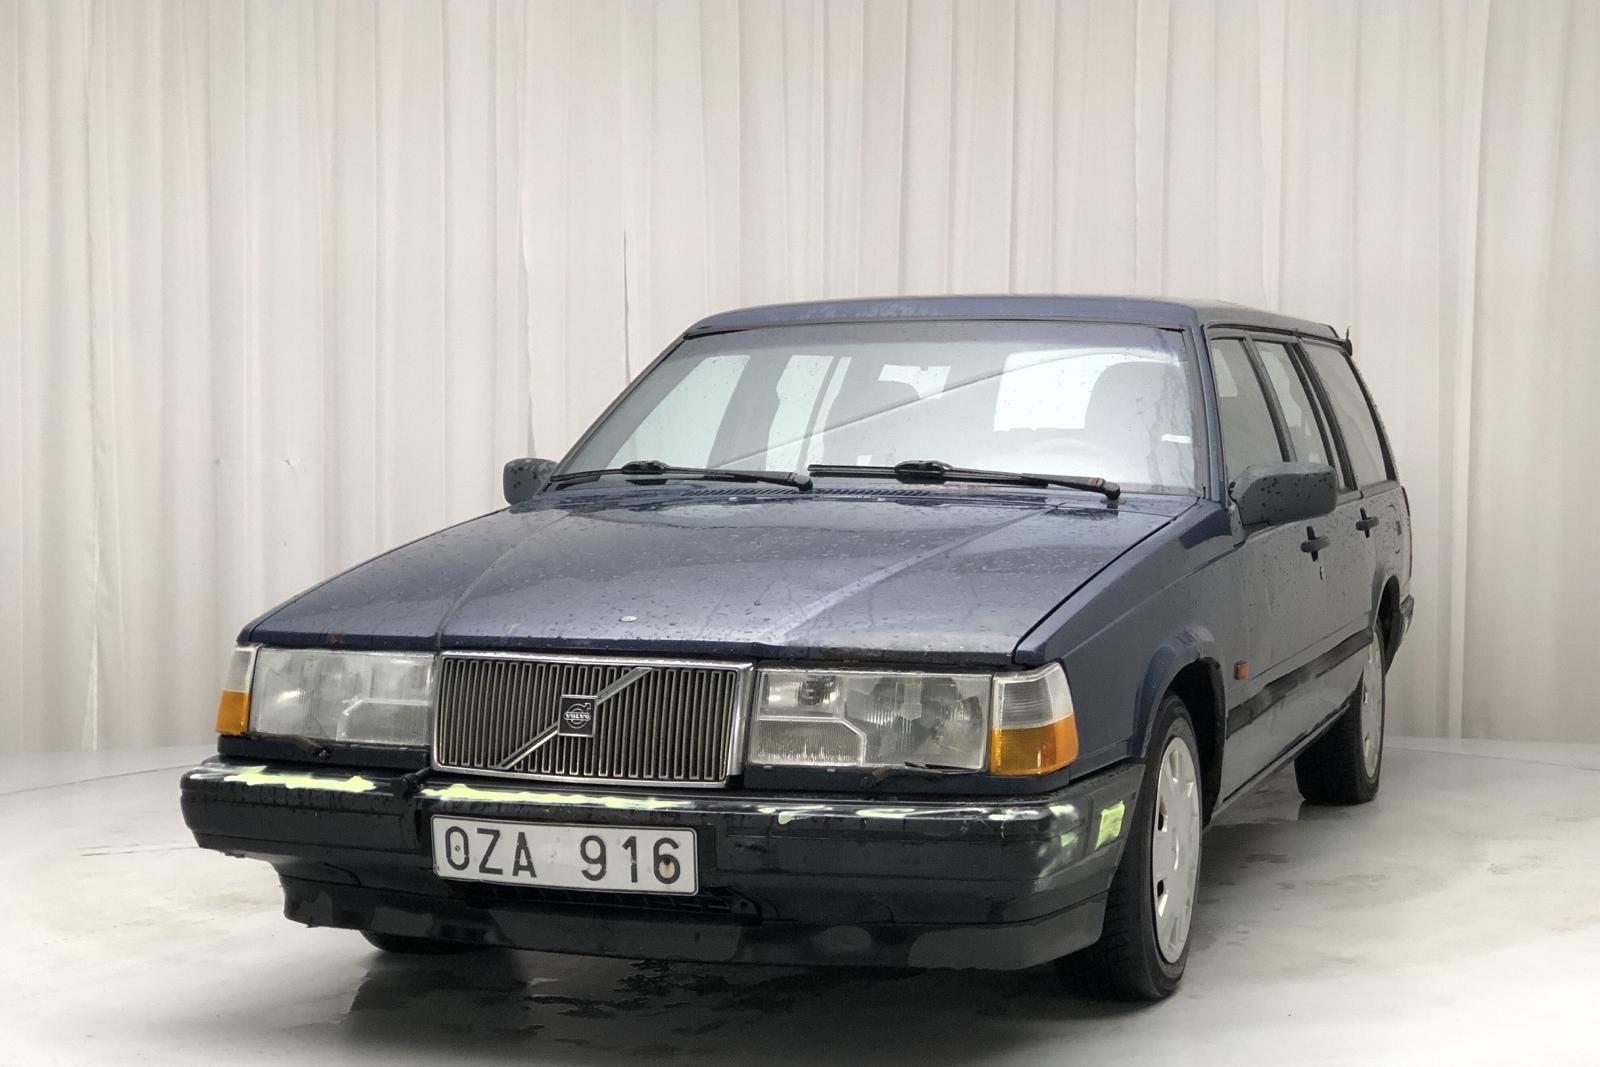 Volvo 945 2.3 (135 PS)